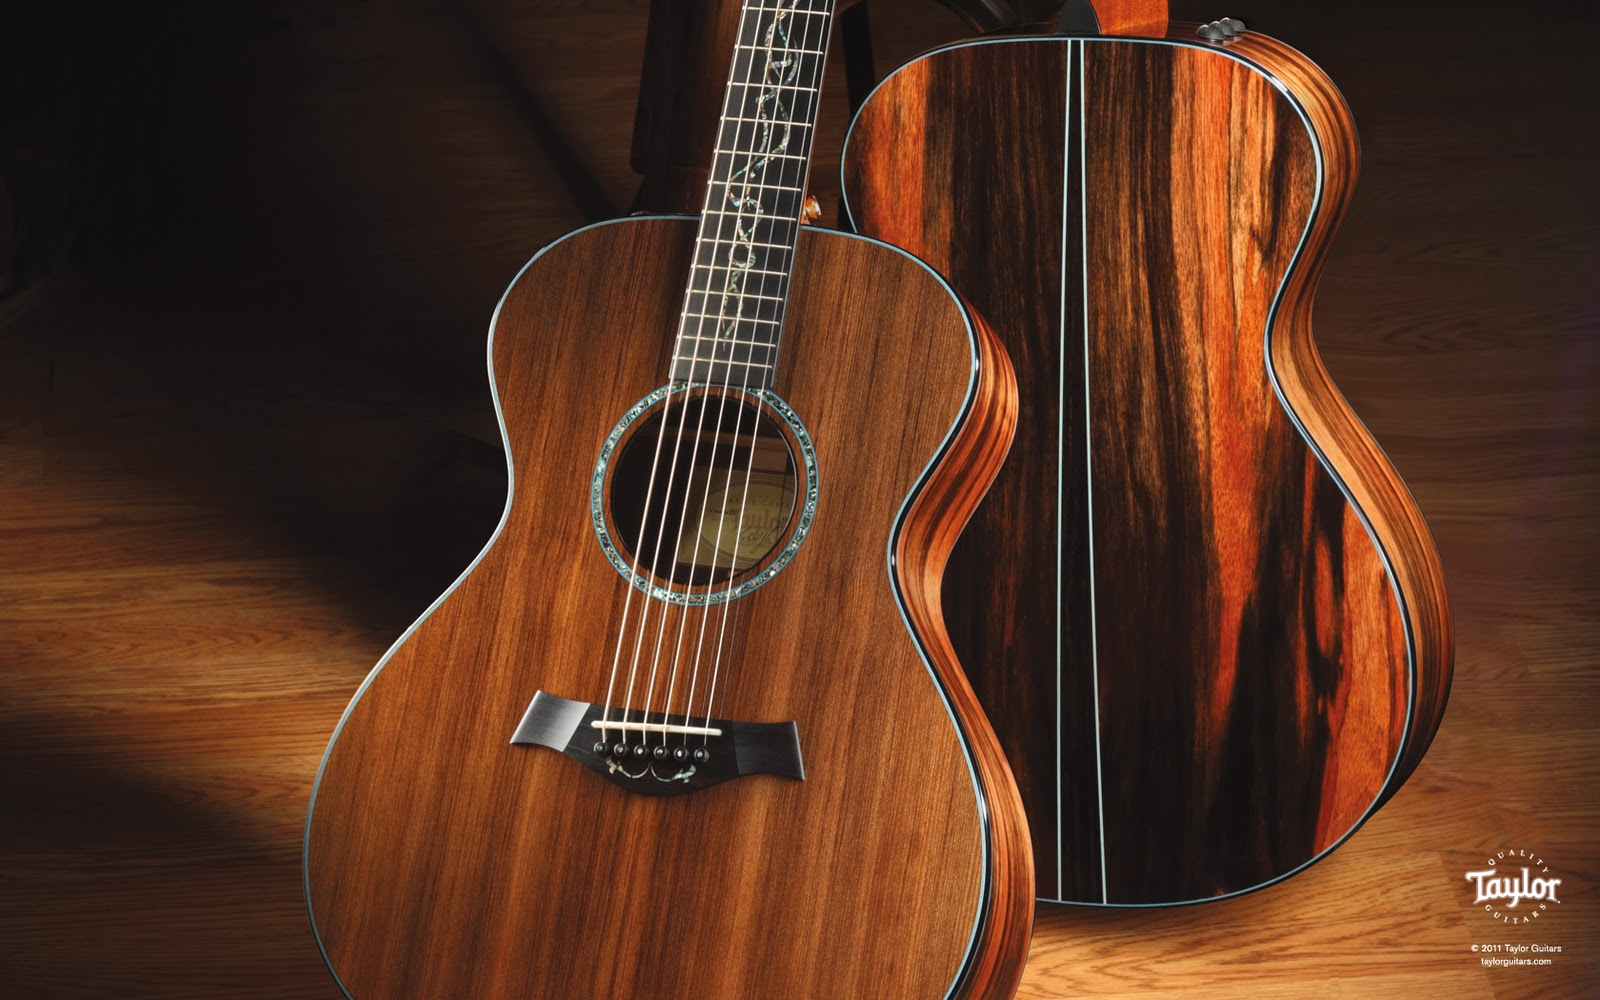 taylor guitars wallpapers - photo #8